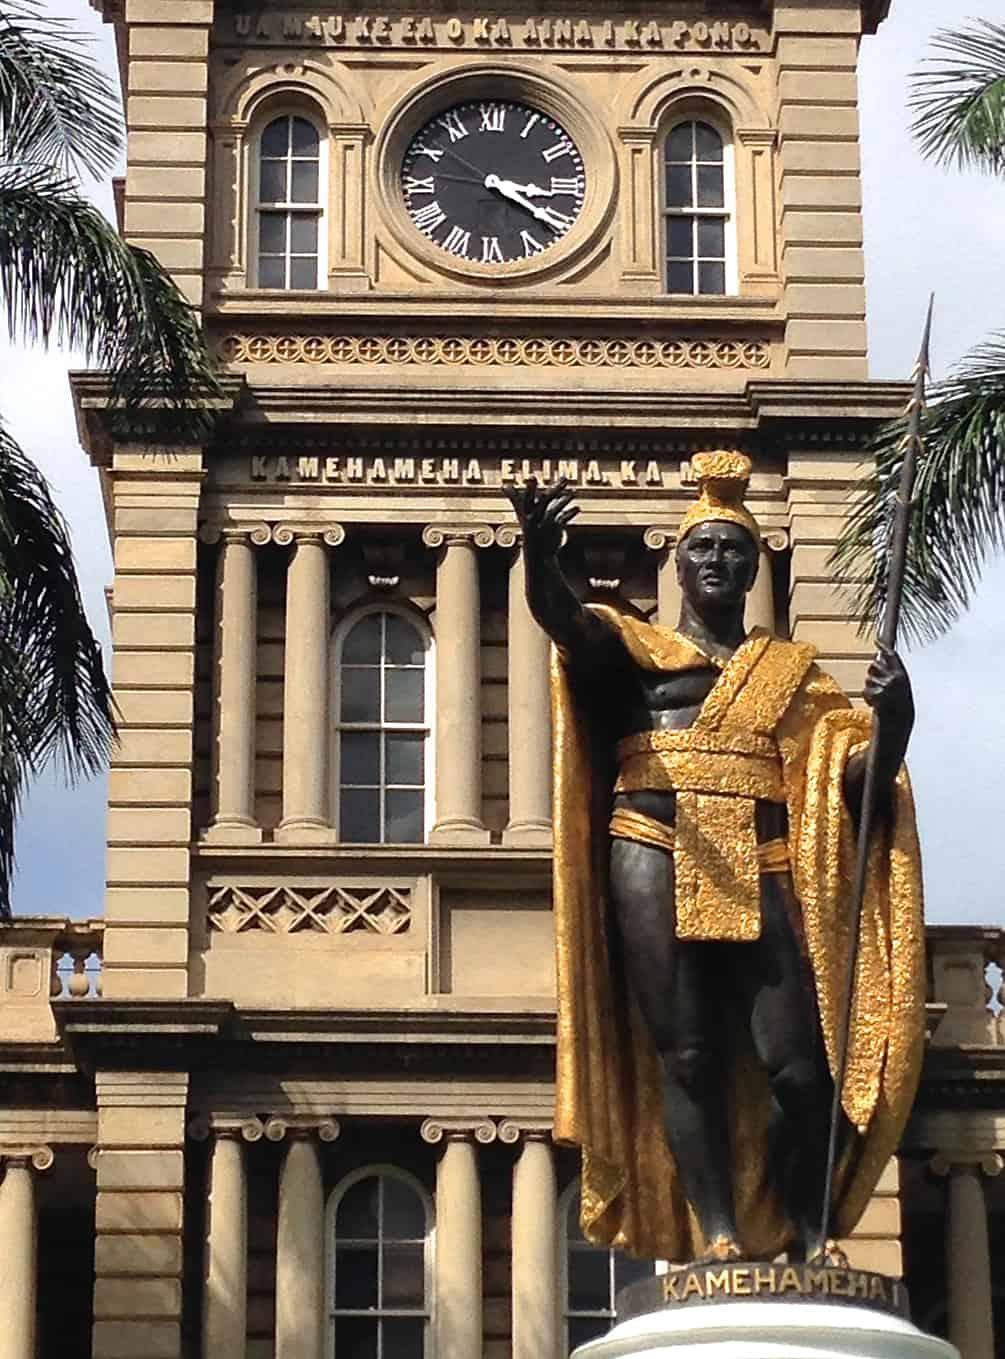 kamehameha-aliiolani-hale, seen on the Honolulu Architectural Walking Tour